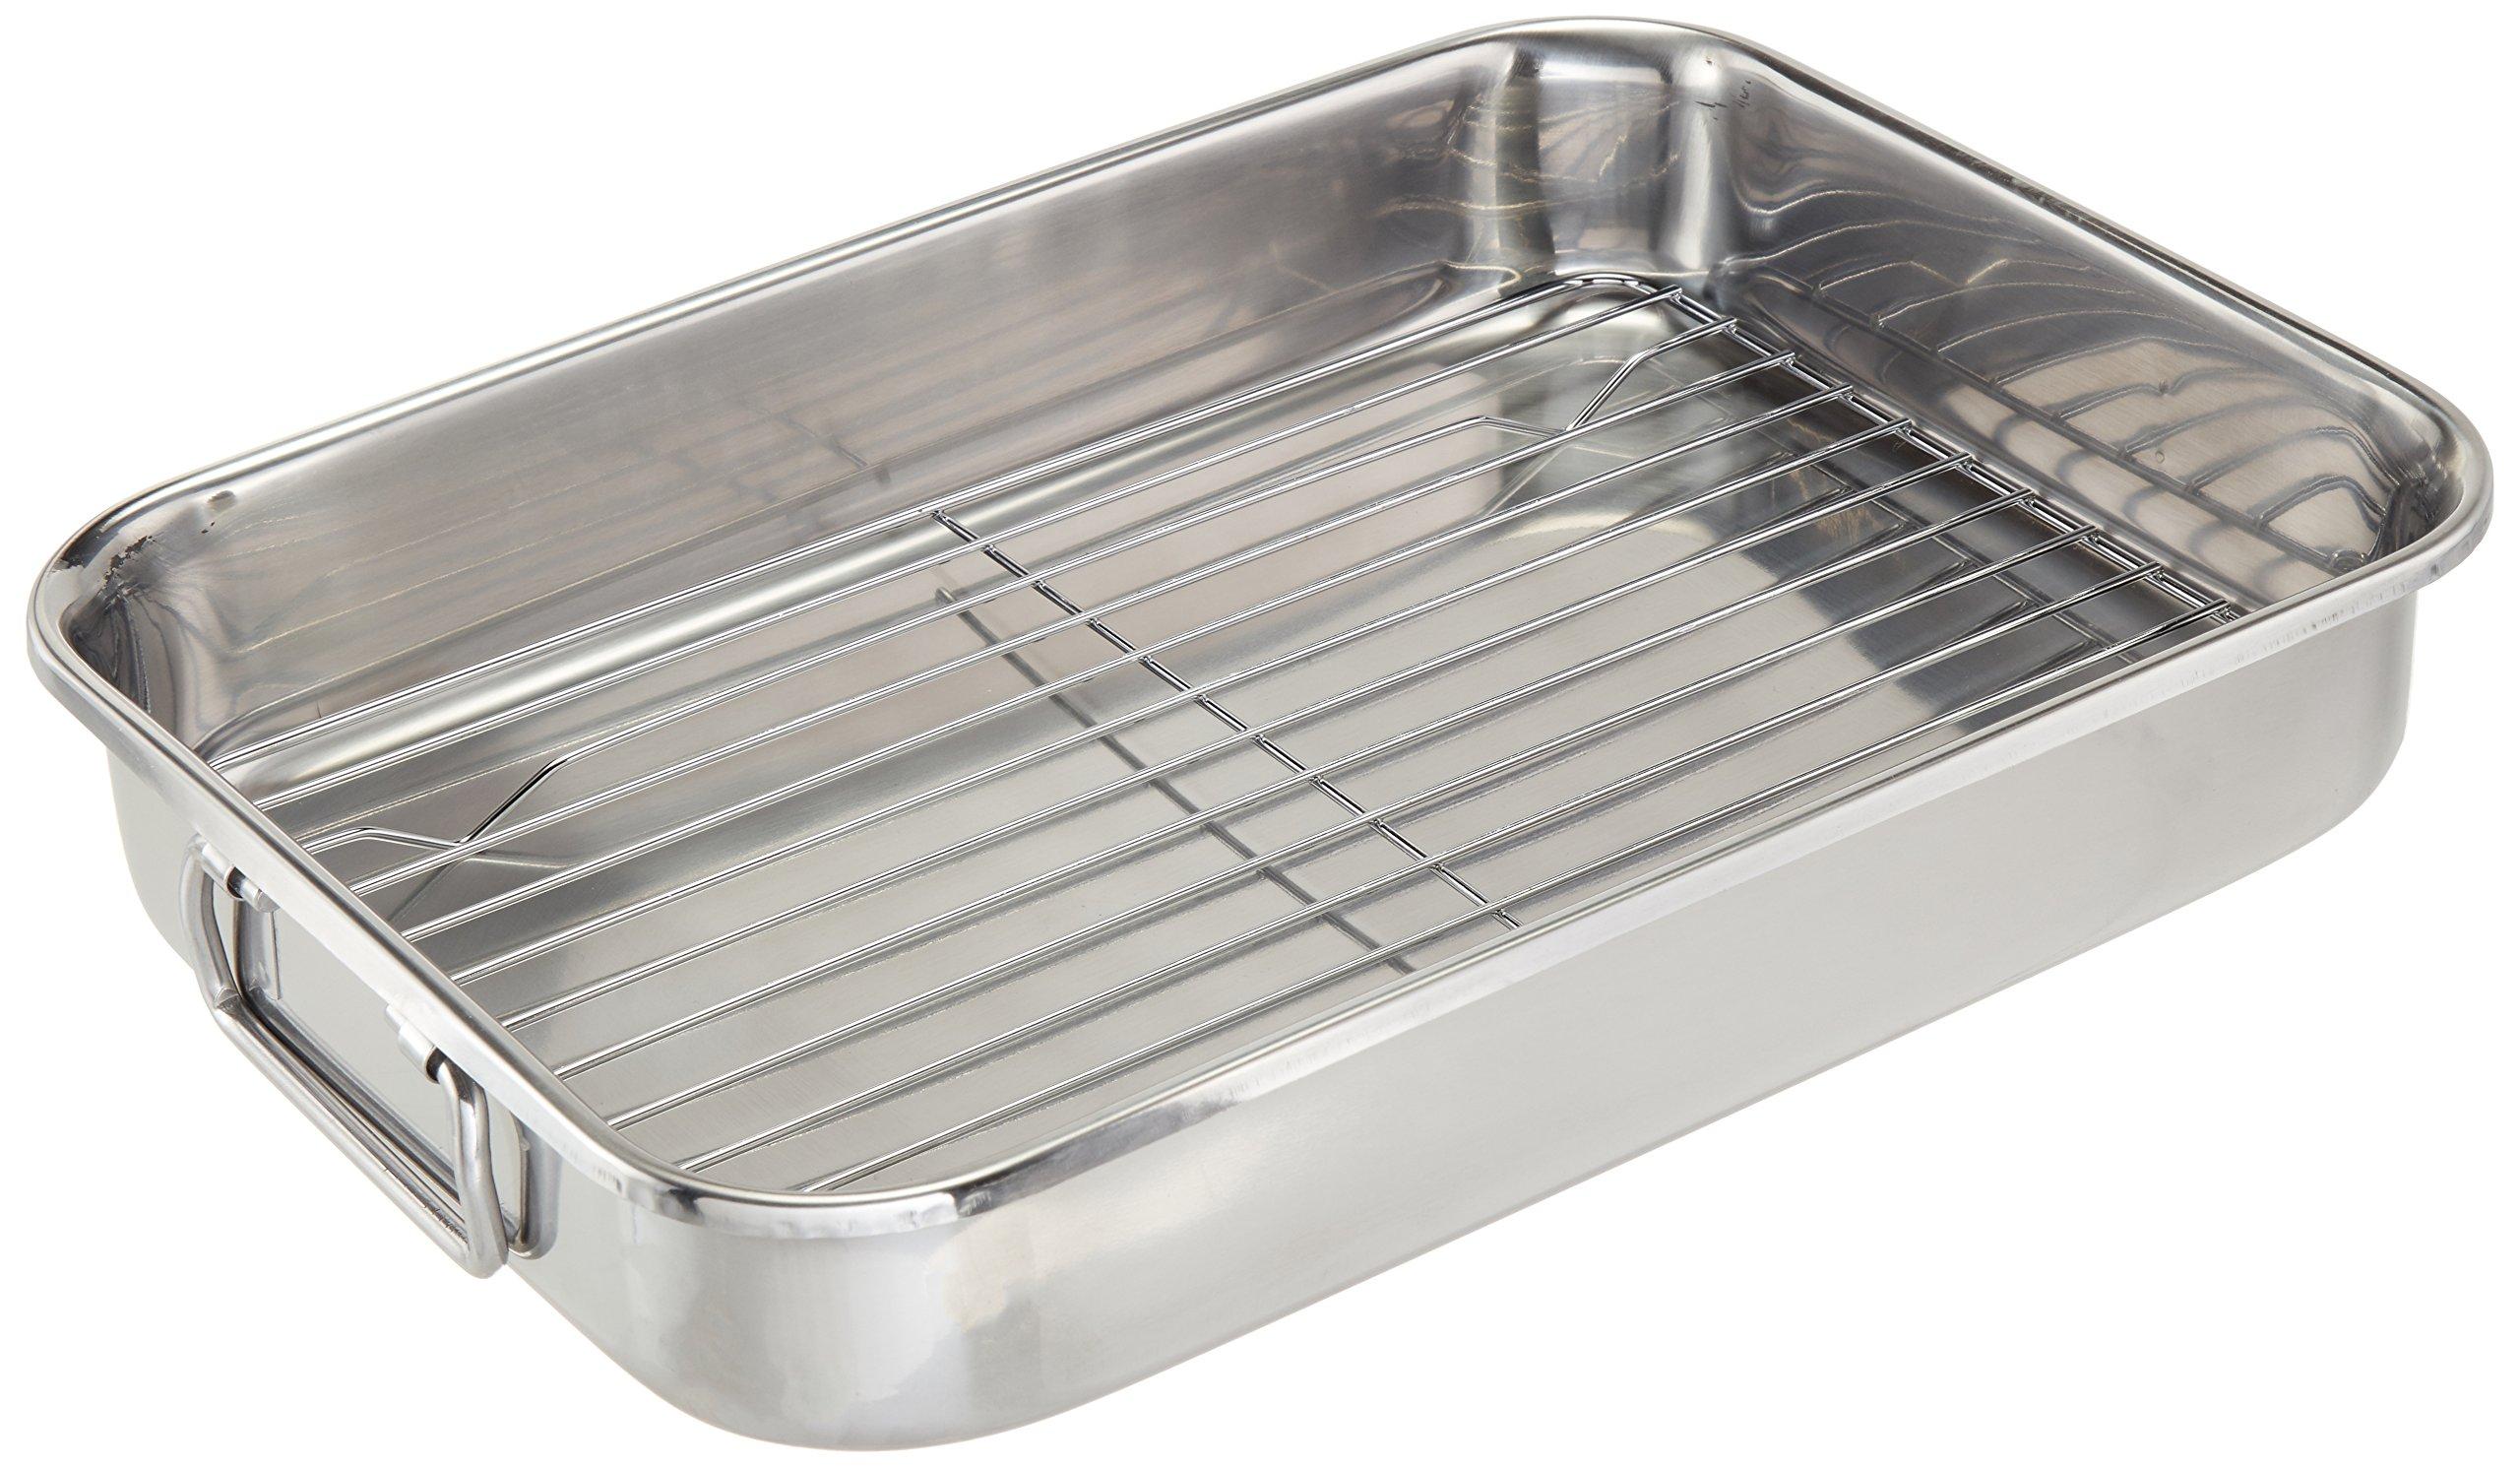 ExcelSteel 592 Roasting Pan, Stainless by ExcelSteel